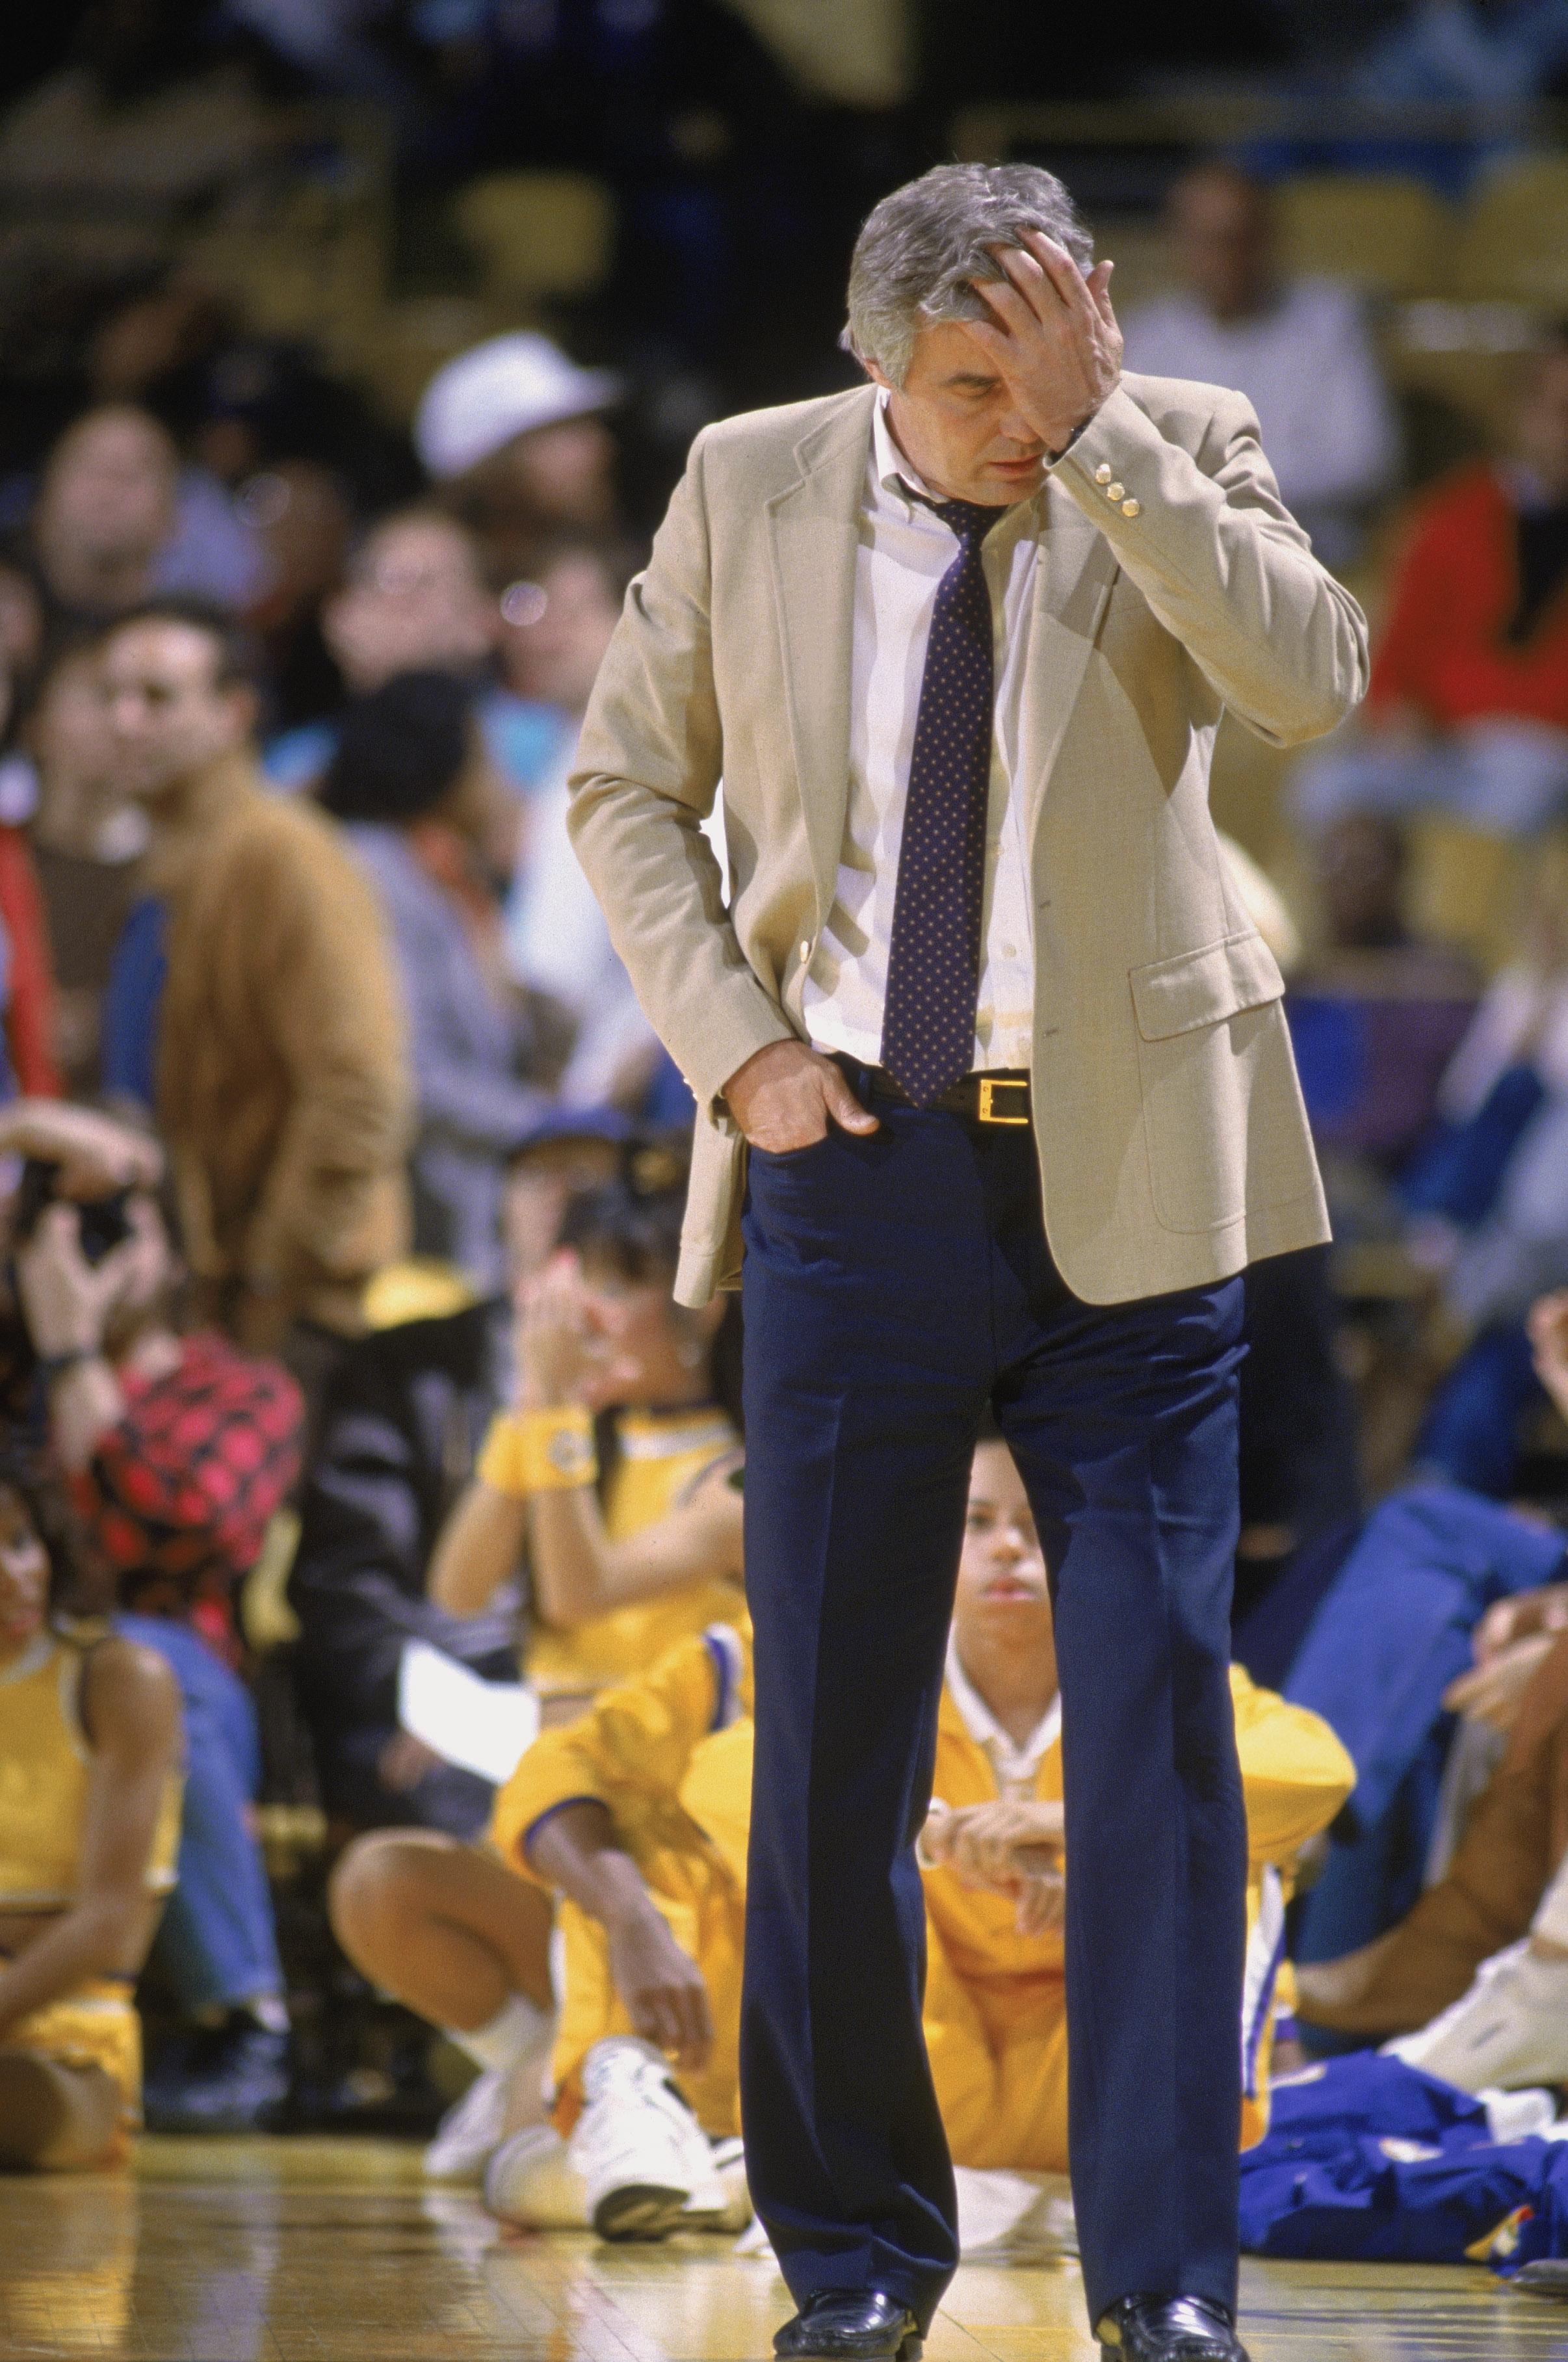 Doug Moe: Denver Nuggets Coach 80-81 through 90-91